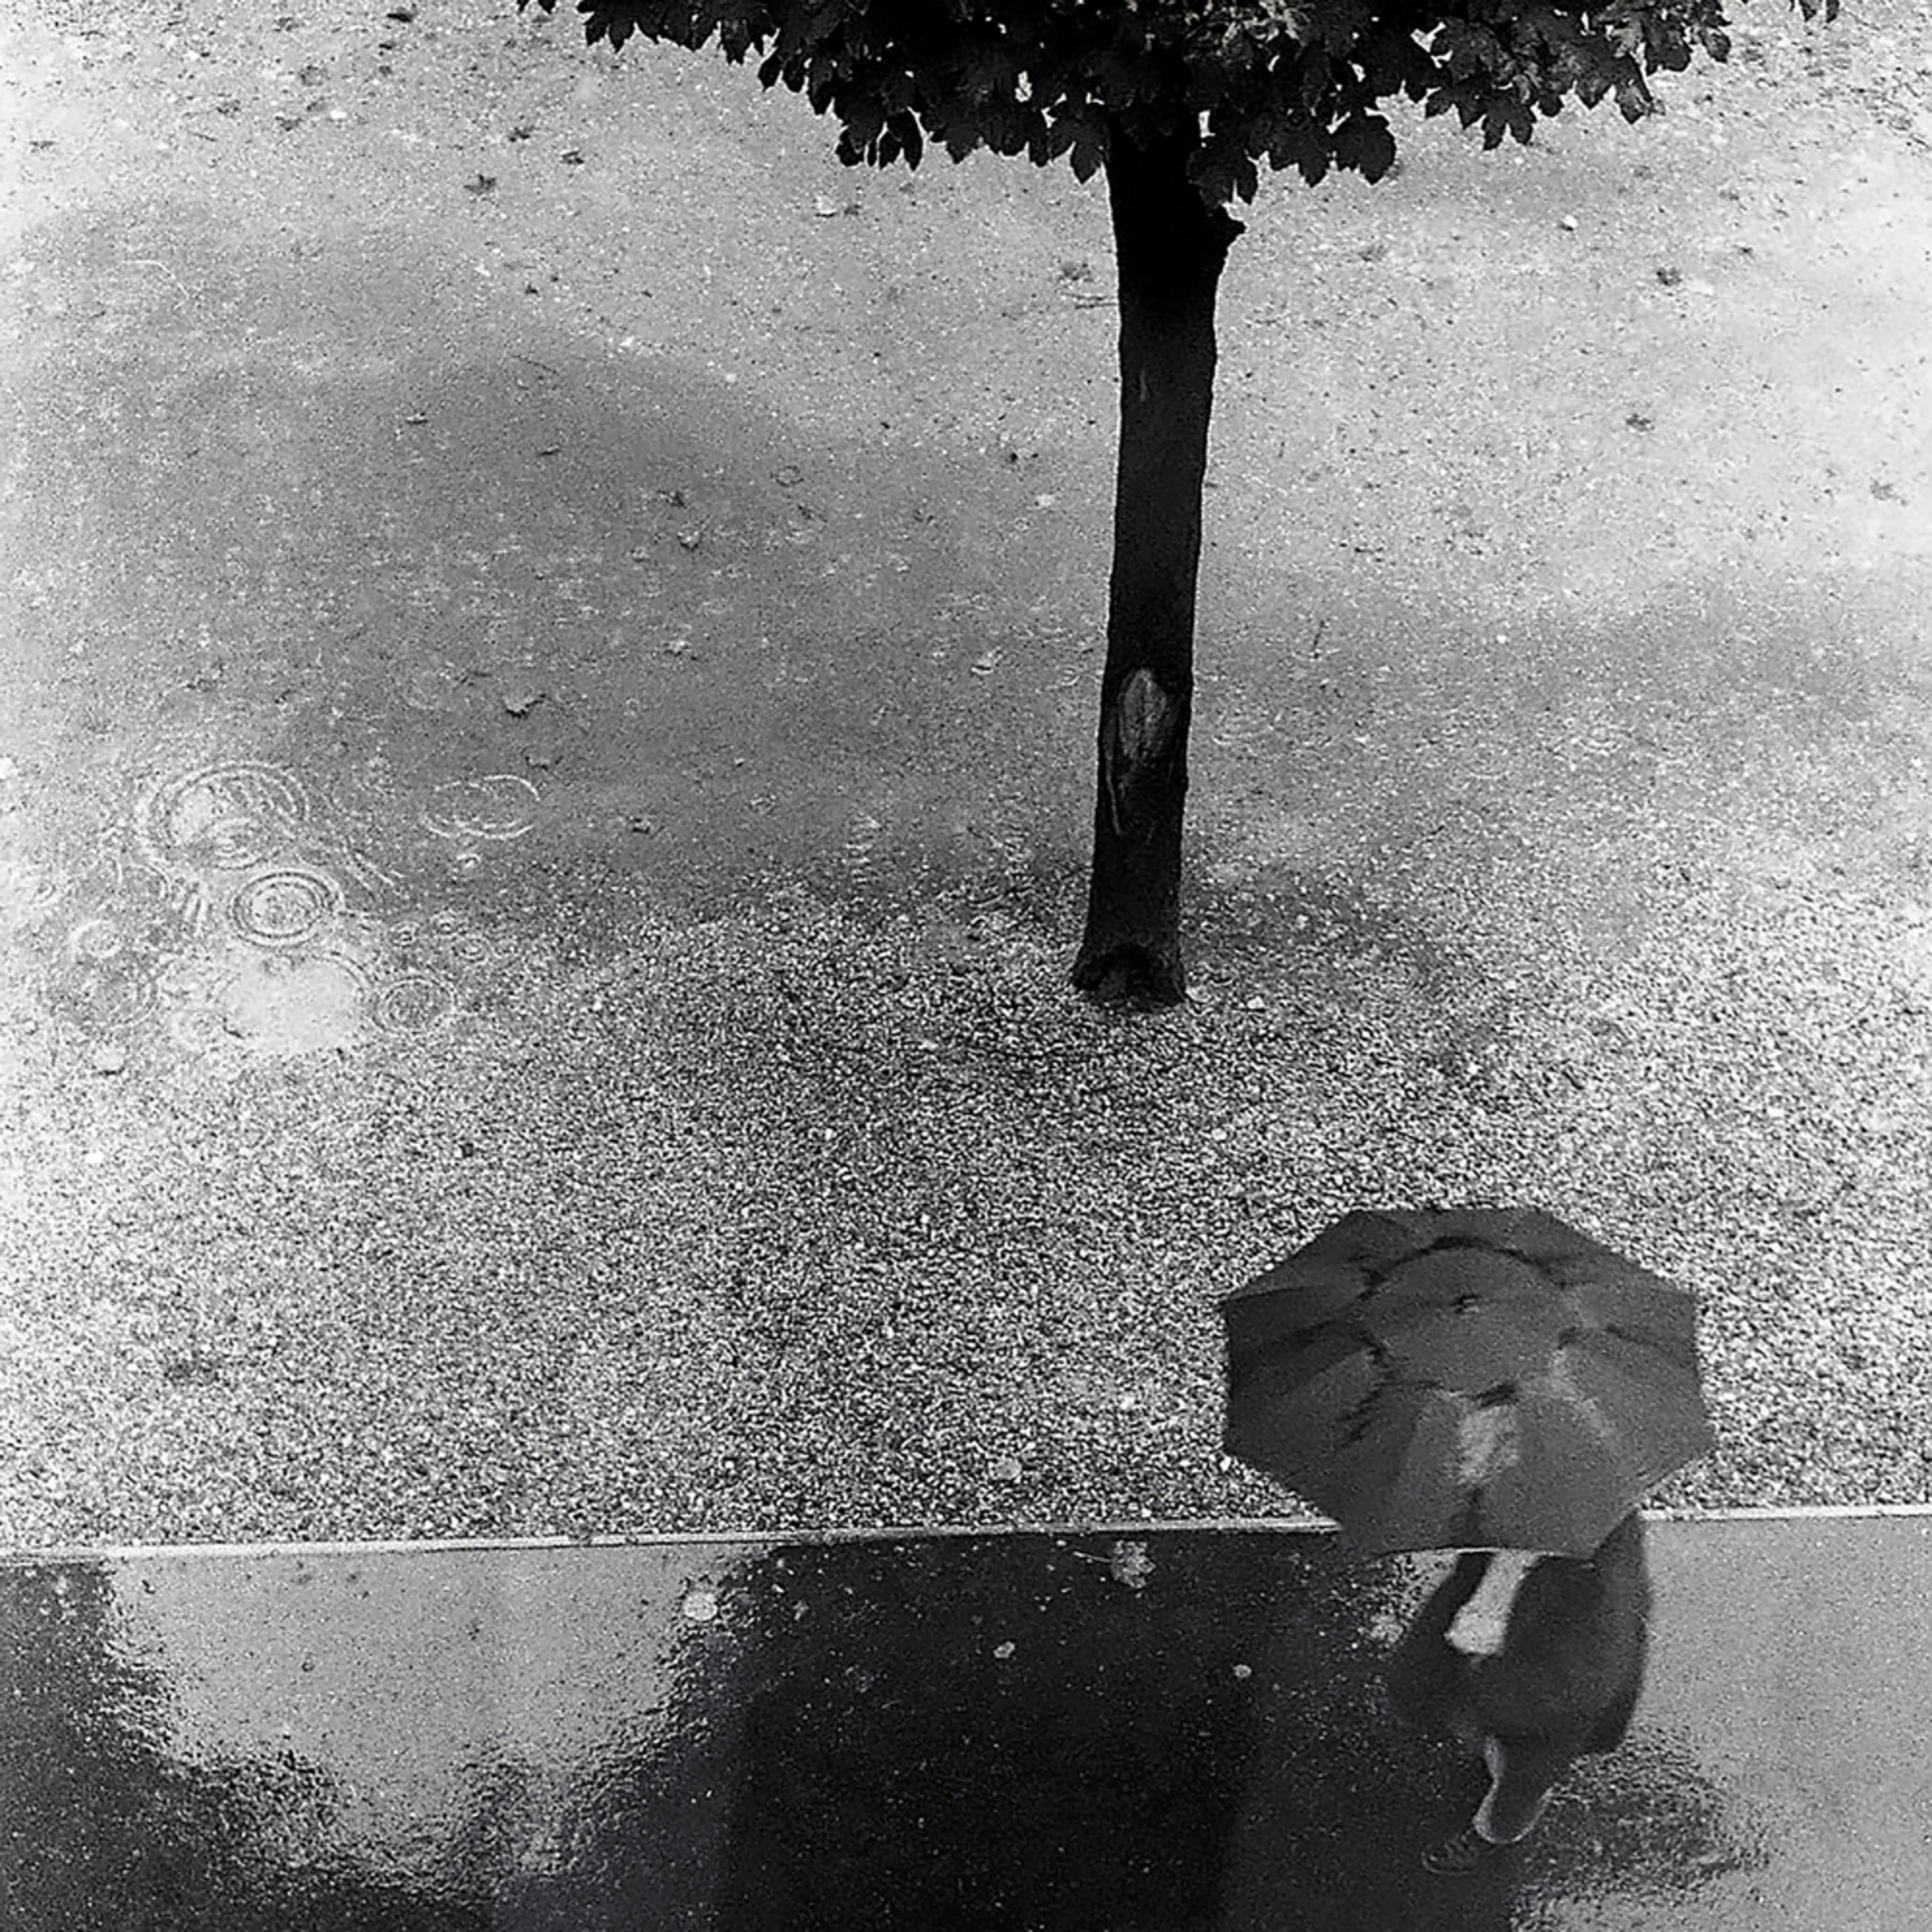 Man with umbrella paris copy 8x10 wj0bwo